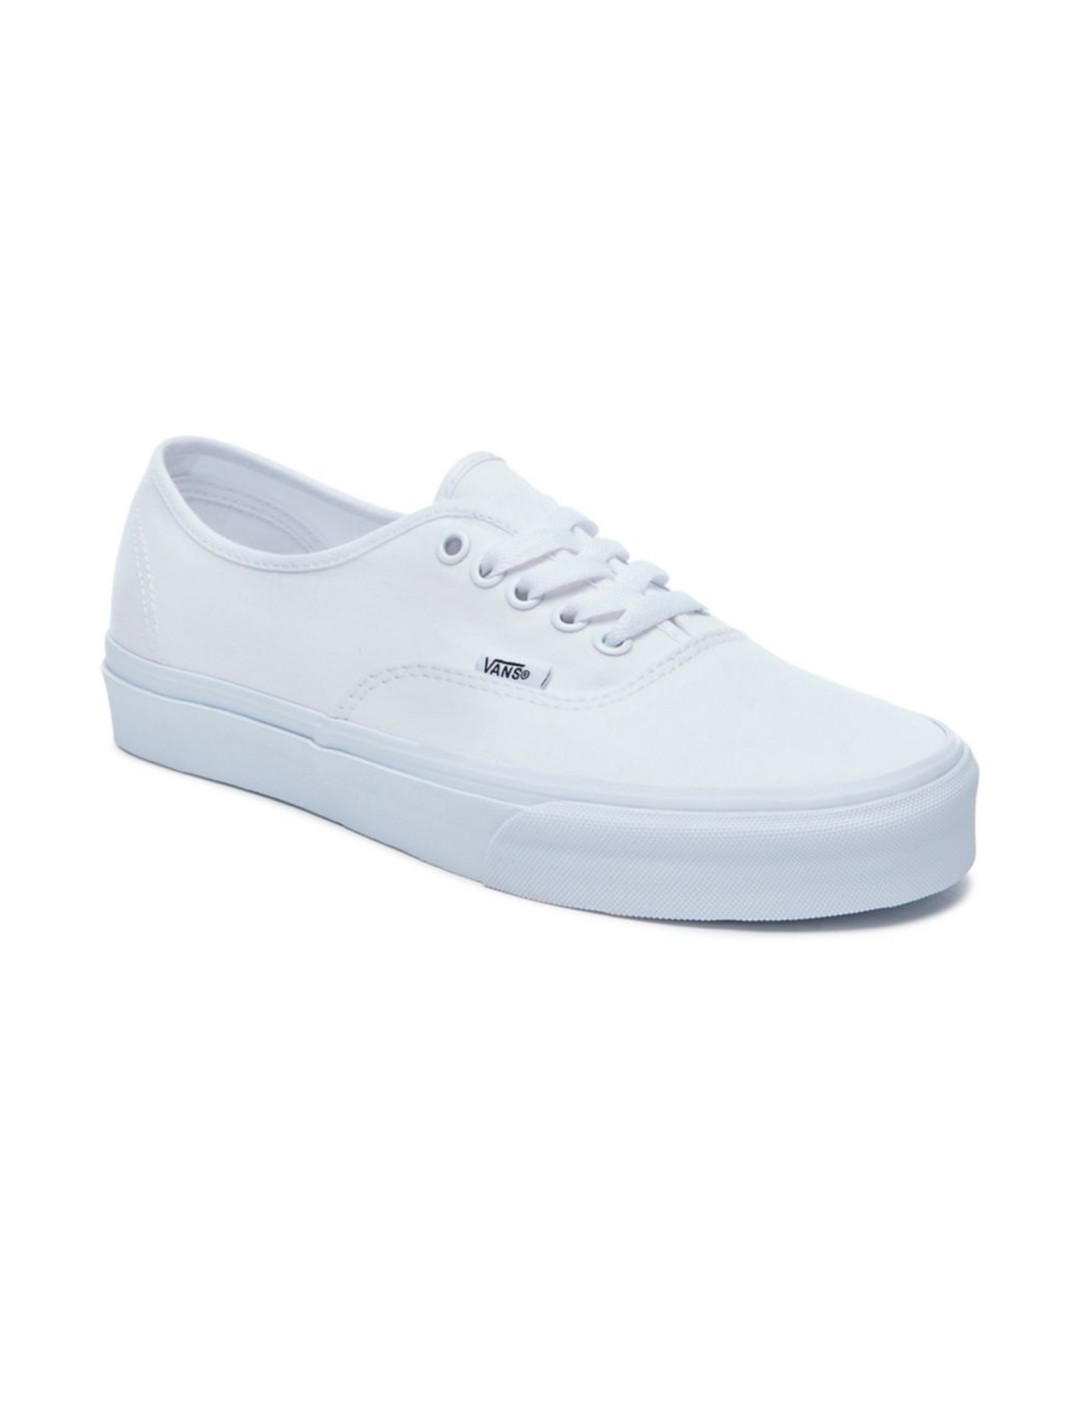 White Shoes Clothing